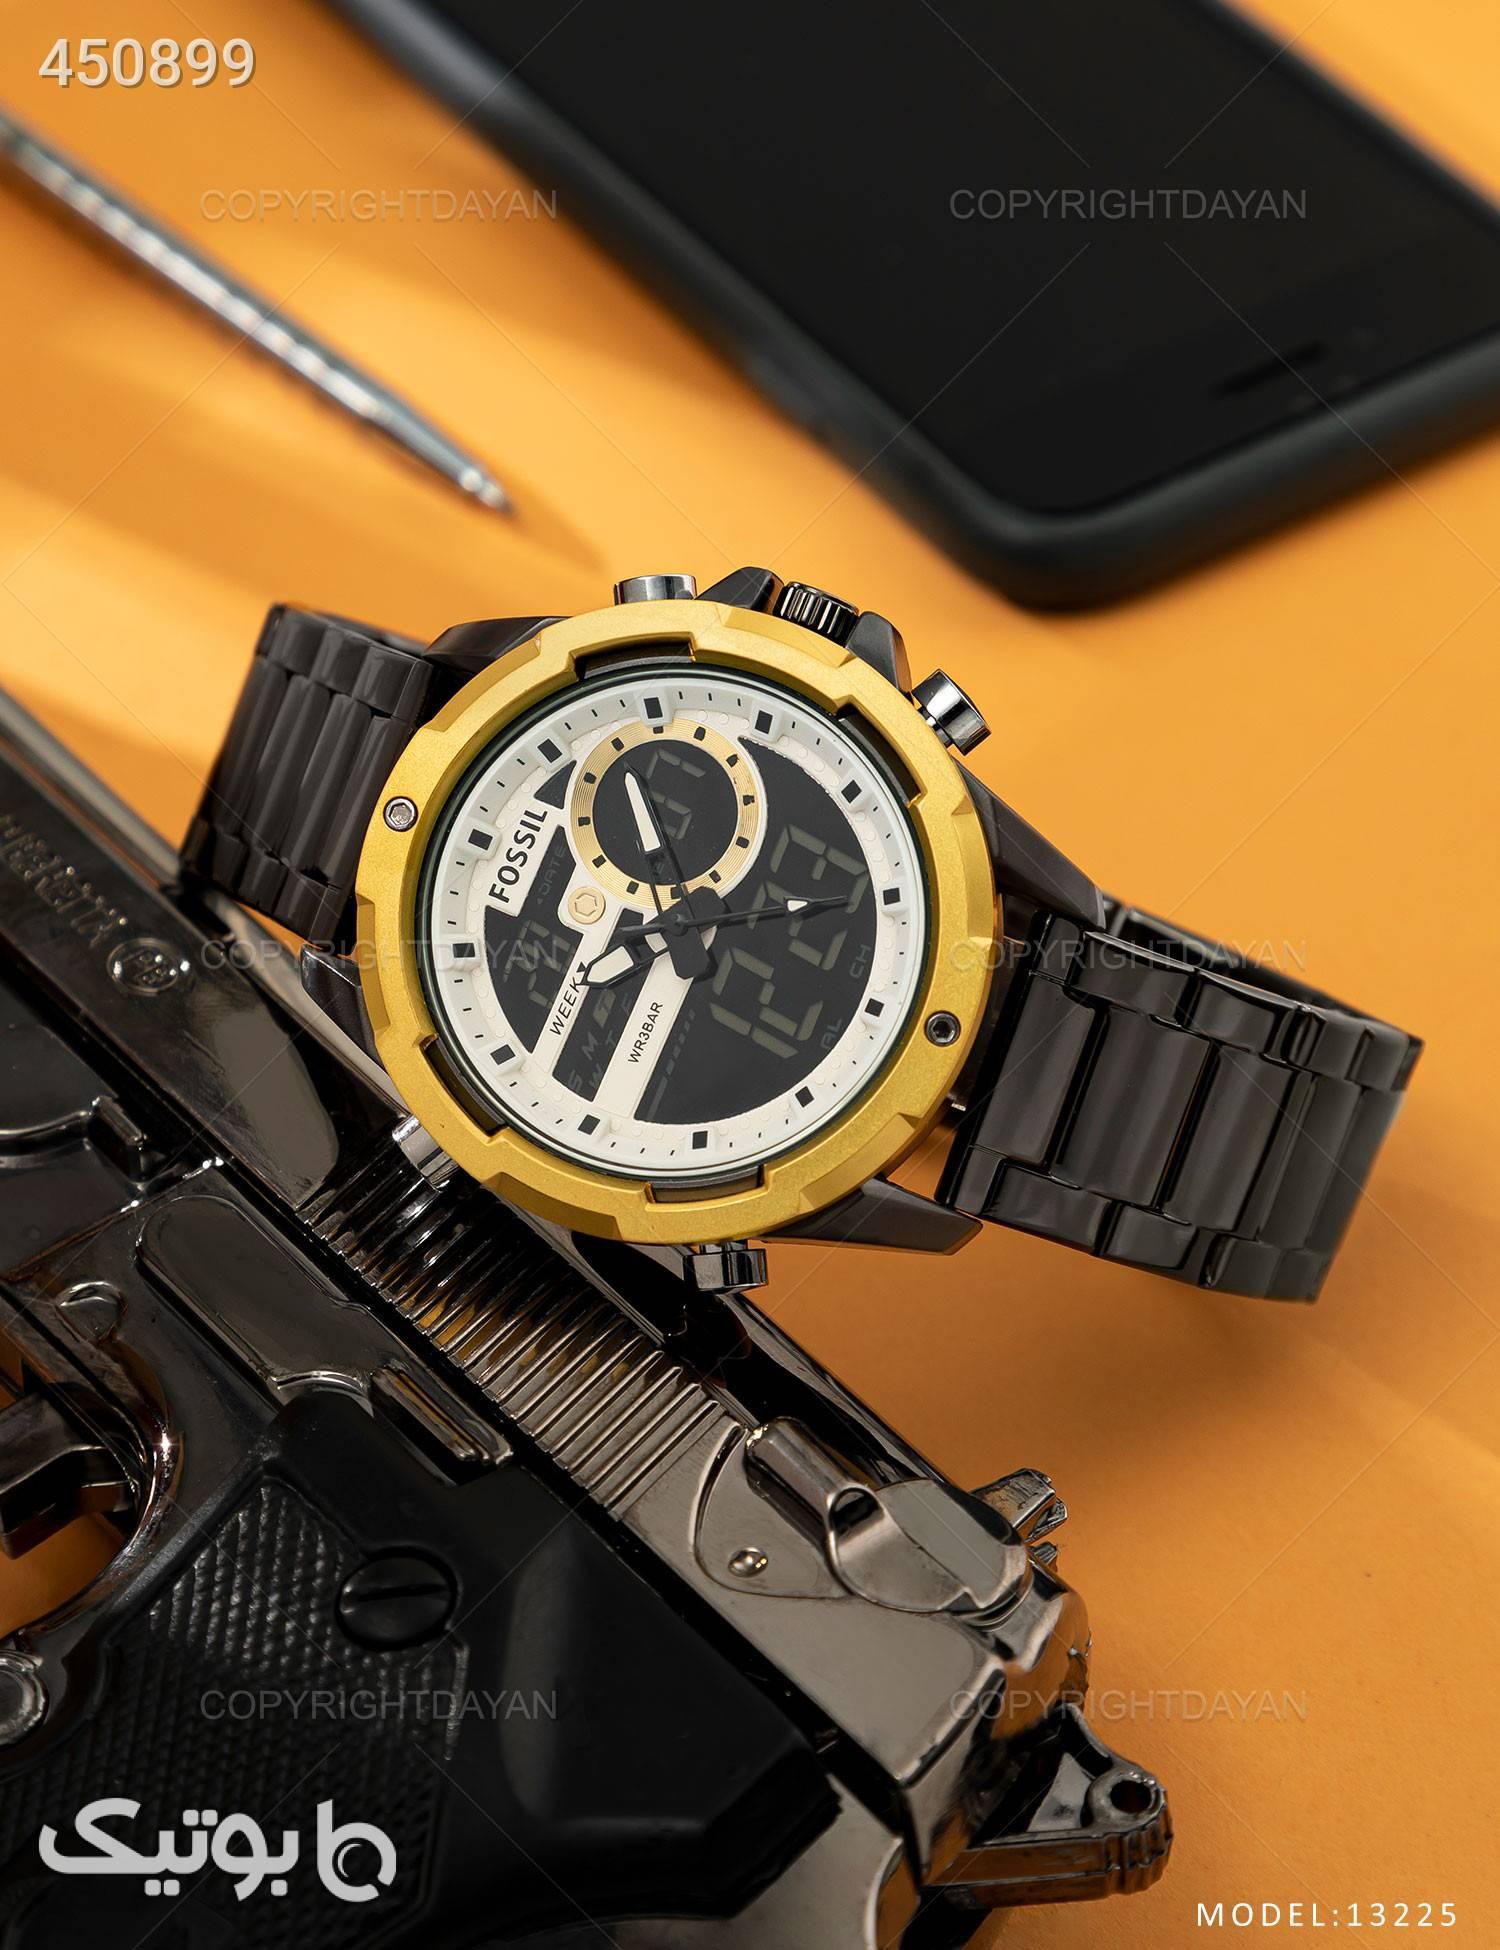 ساعت مچی مردانه Fossil مدل 13225 مشکی ساعت